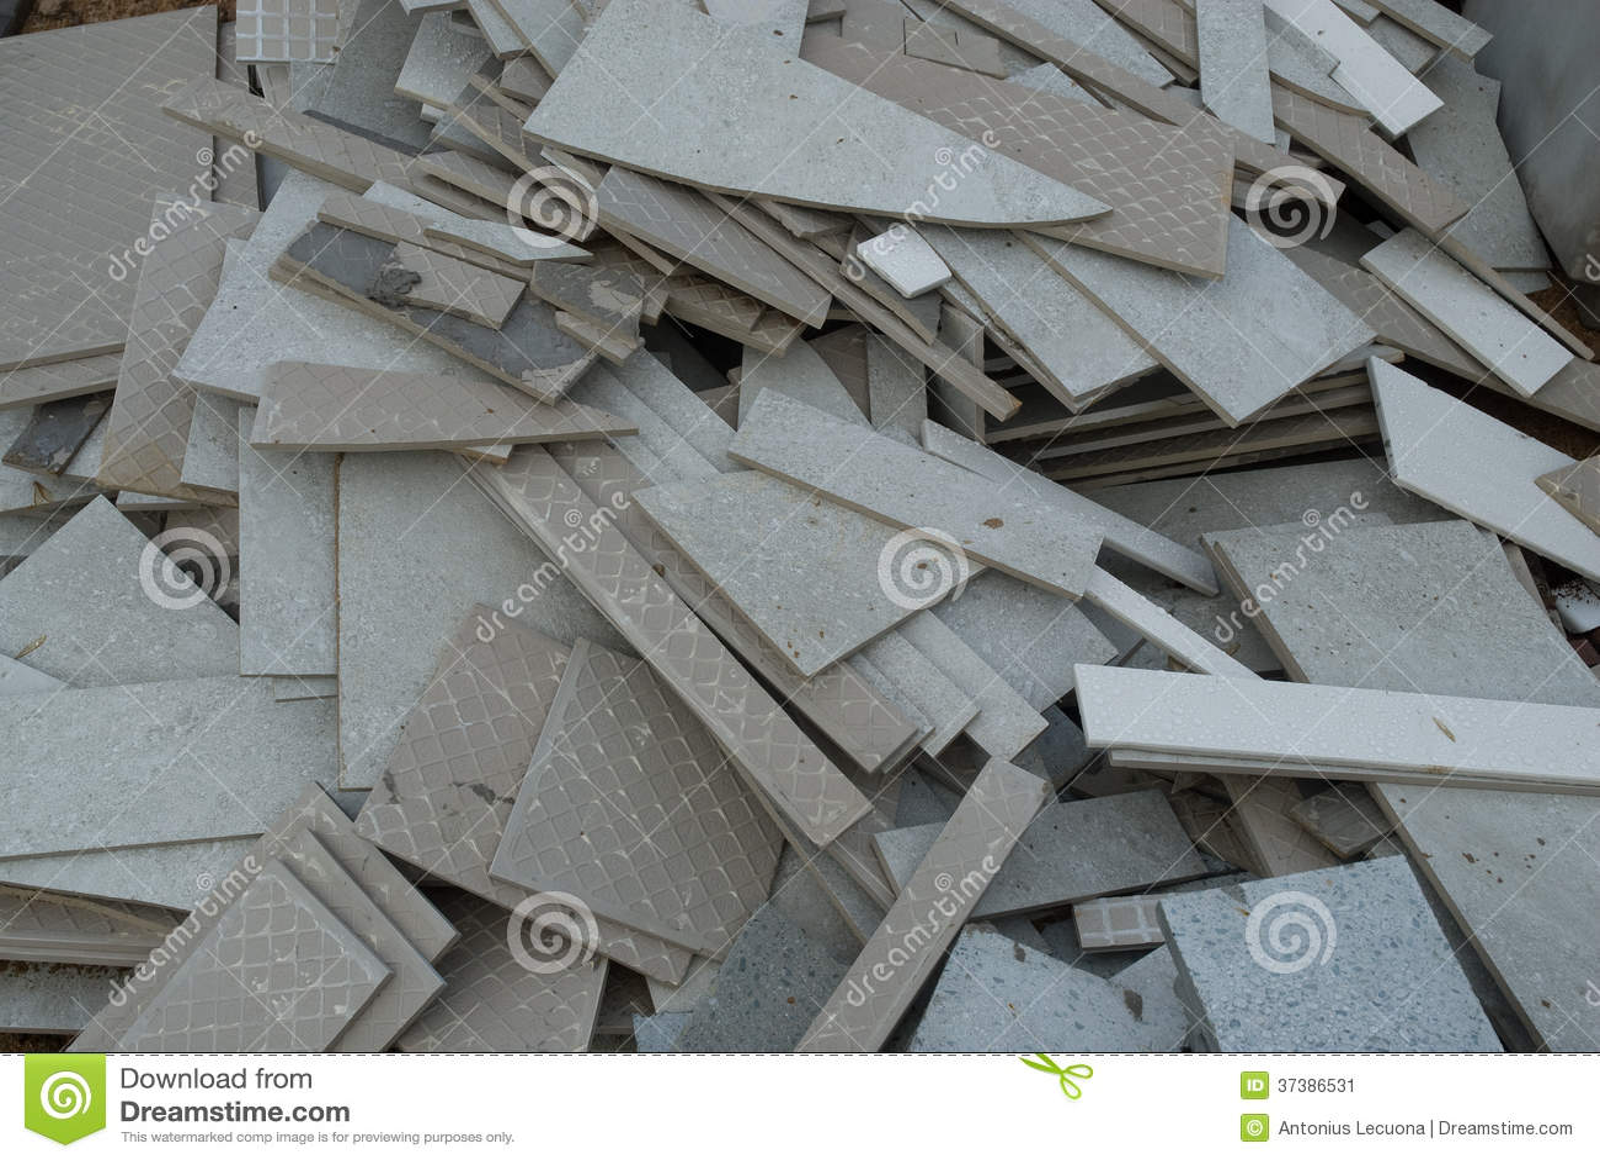 Broken Ceramic Tiles Stock Image Image Of Nobody Broken - Ceramic tile scraps